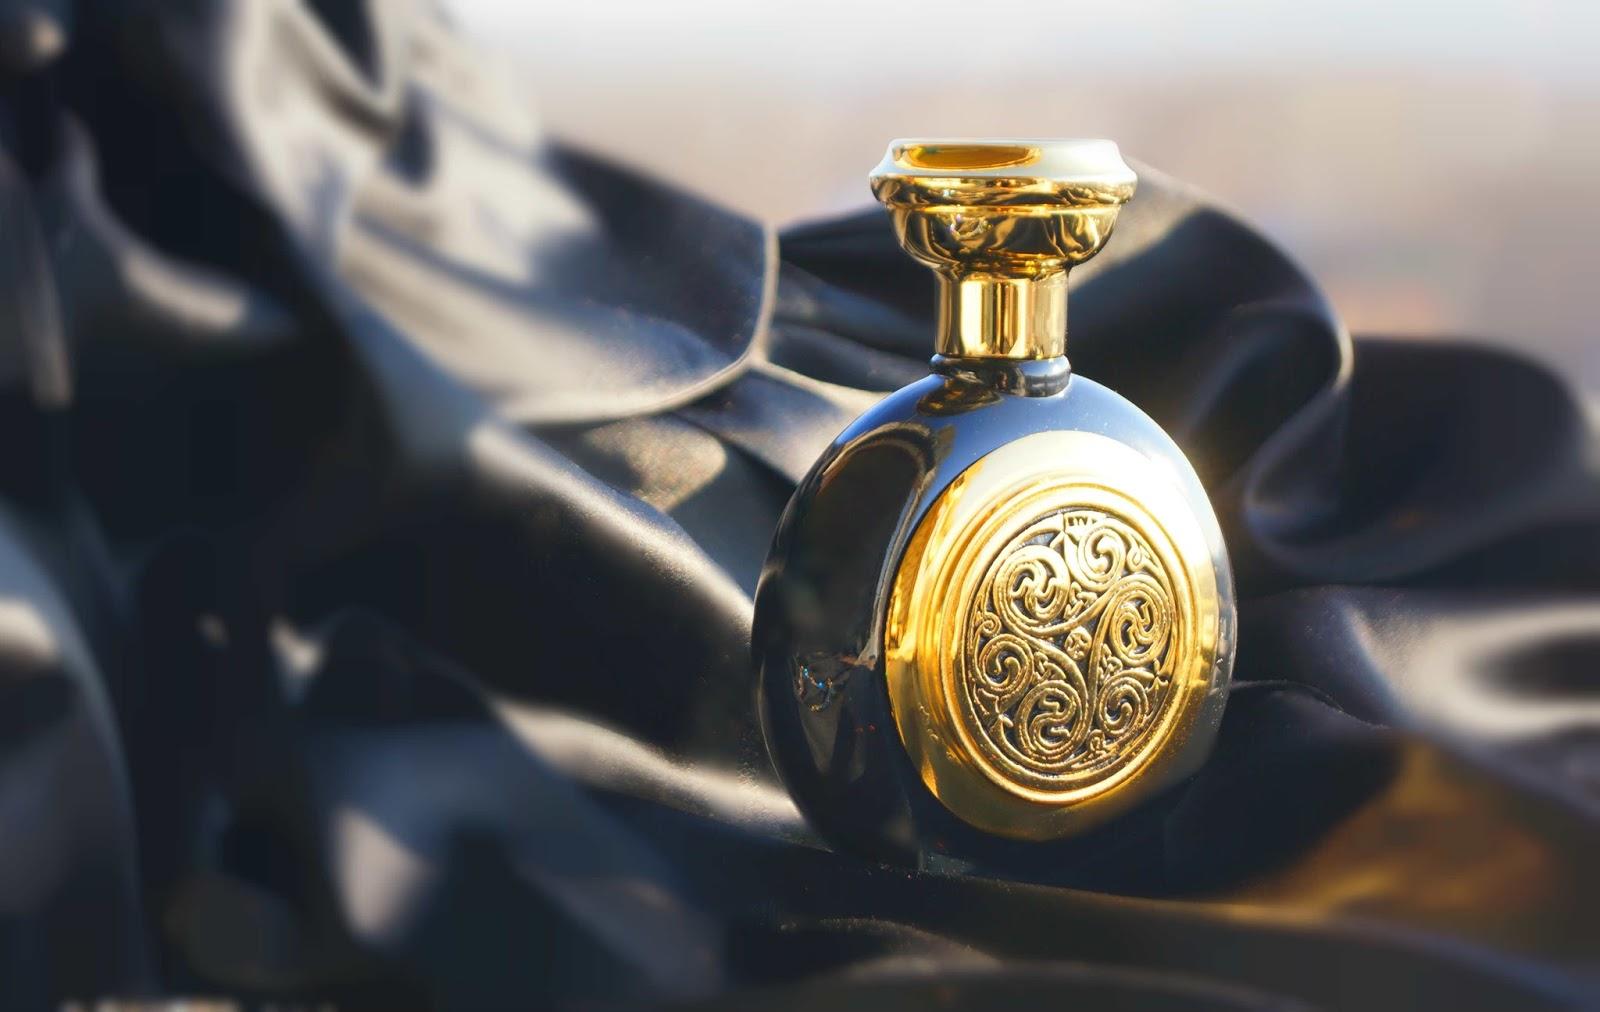 Serenade Boadicea the Victorious - красота черного цвета.